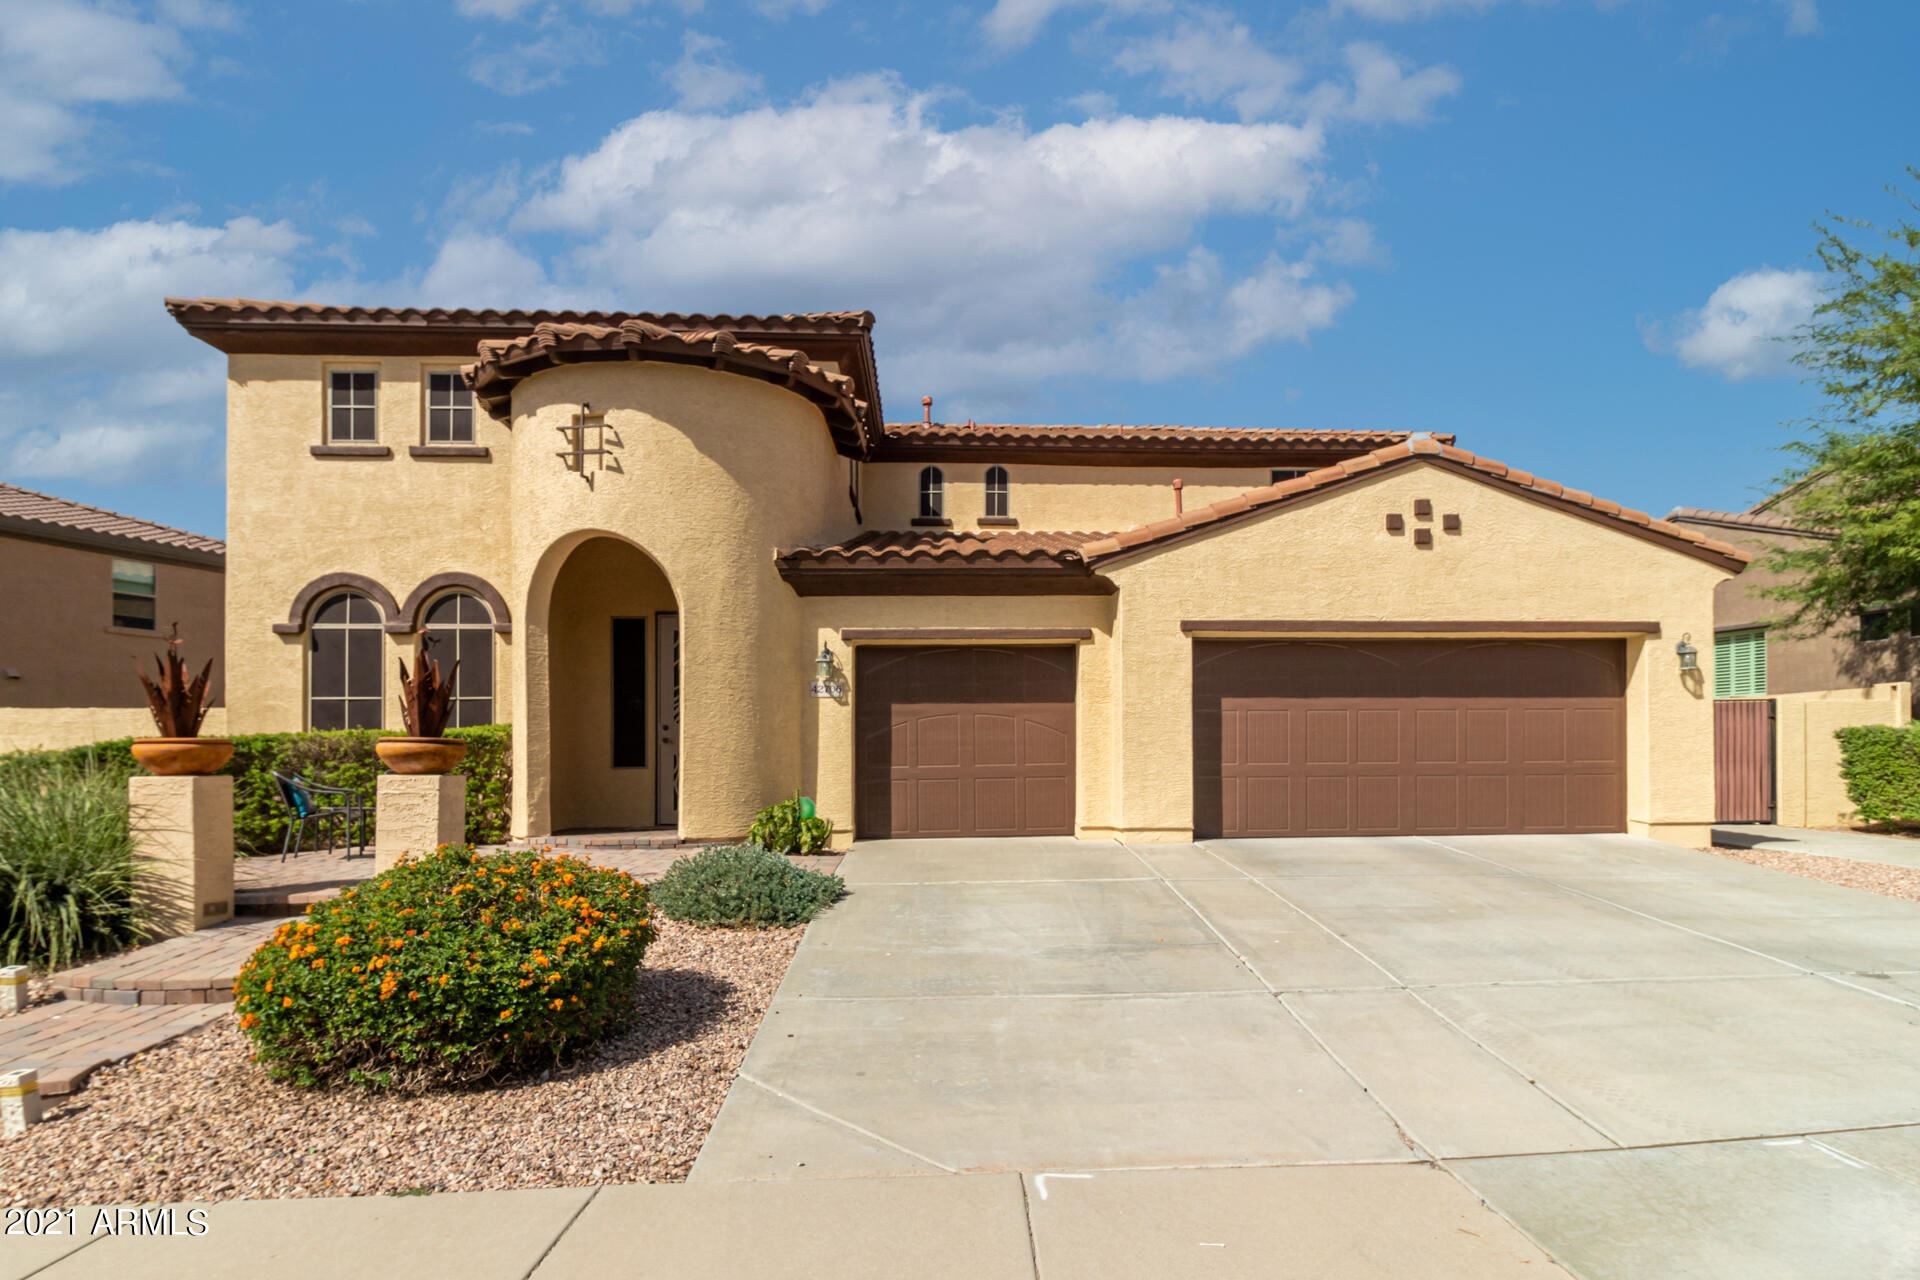 Photo of 42706 N 45TH Drive, New River, AZ 85087 (MLS # 6306713)